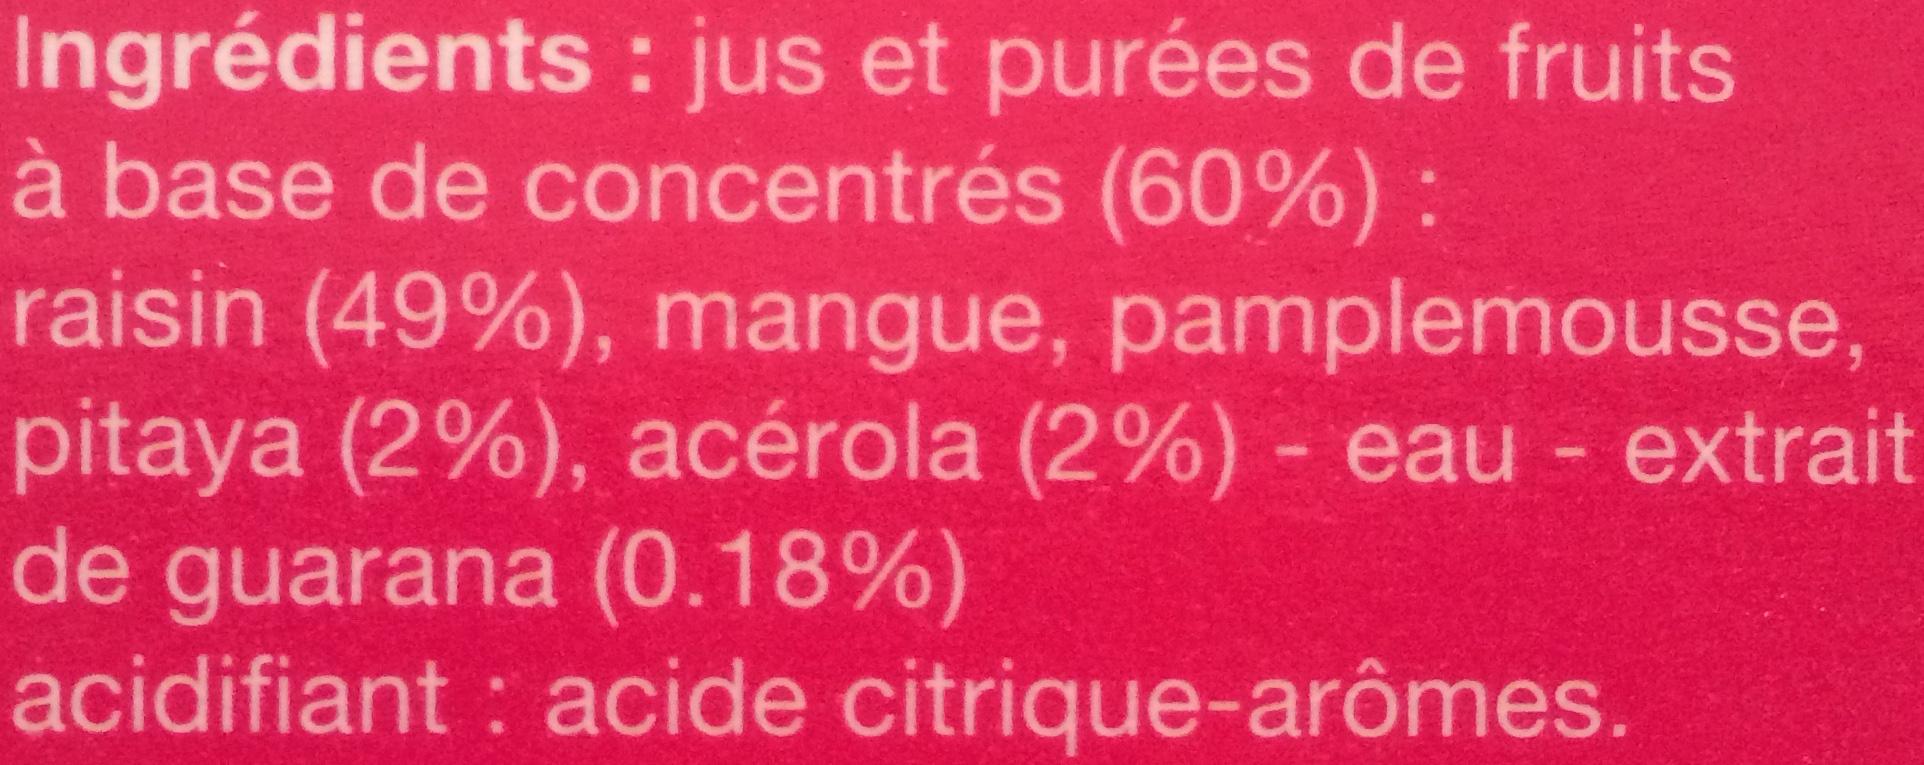 Boisson aux fruits tropicaux (Pitaya, Acerola & Guarana) - Ingrediënten - fr